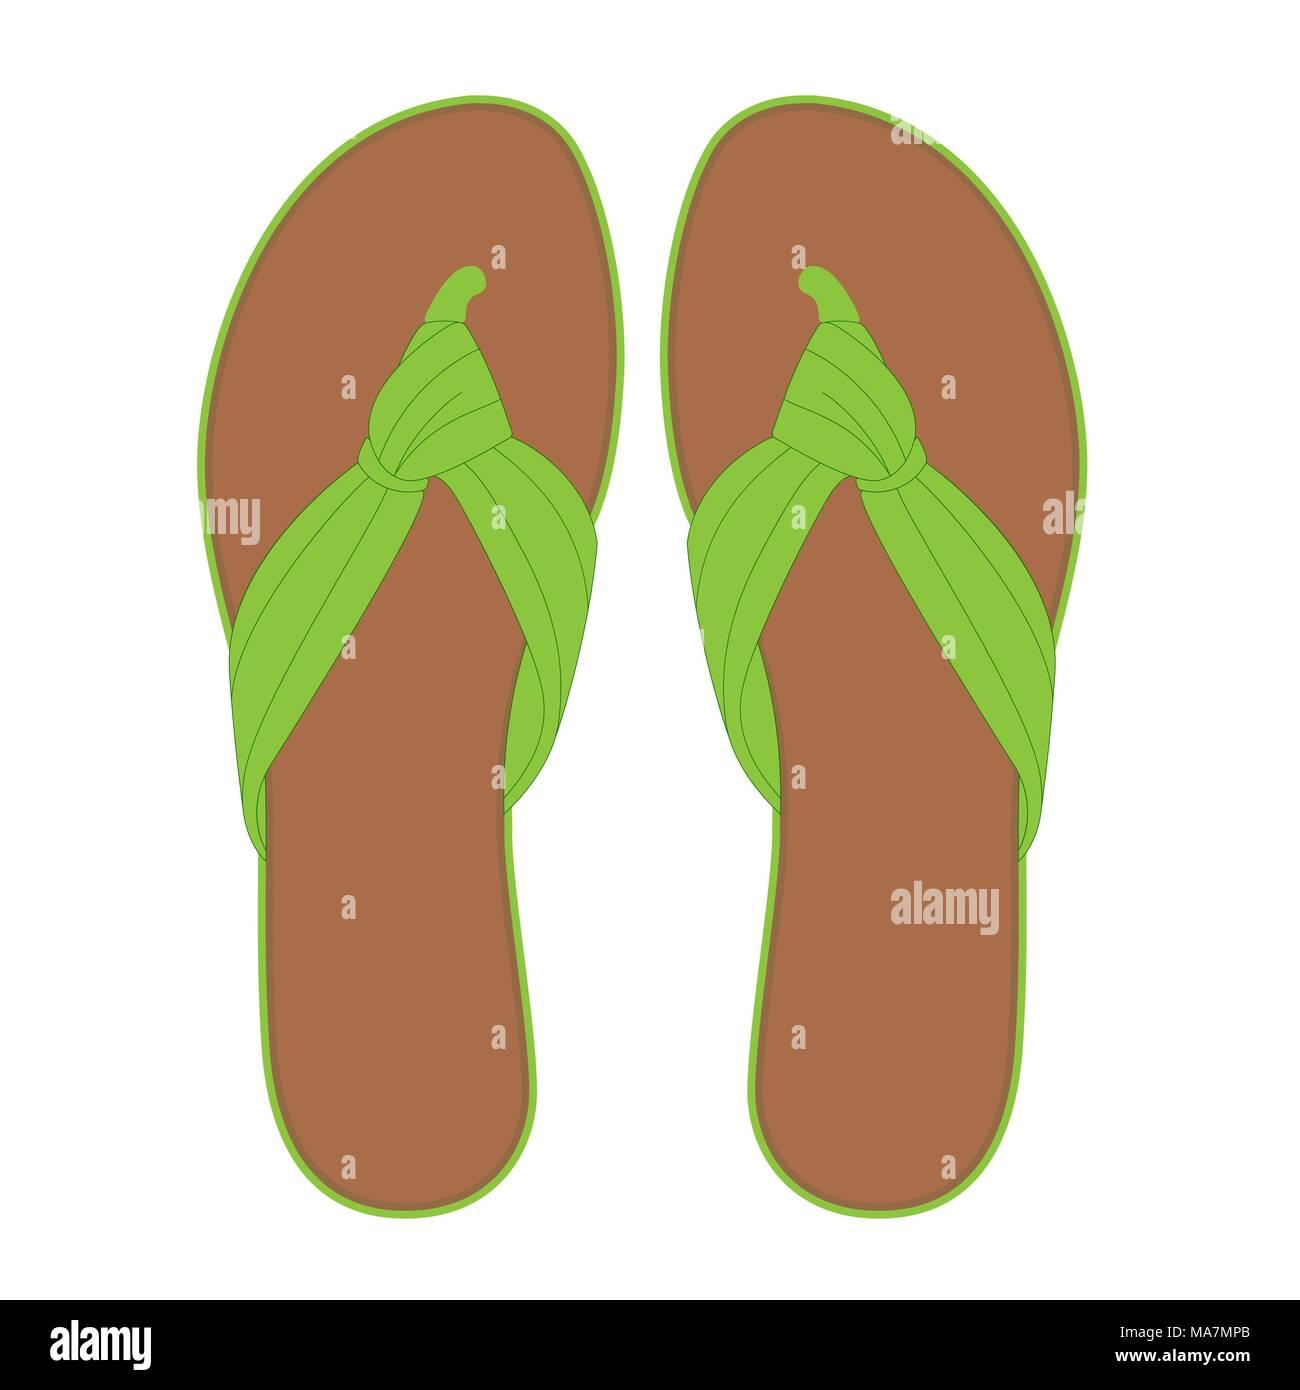 c7d6894397c5 Pair of light green flip flops